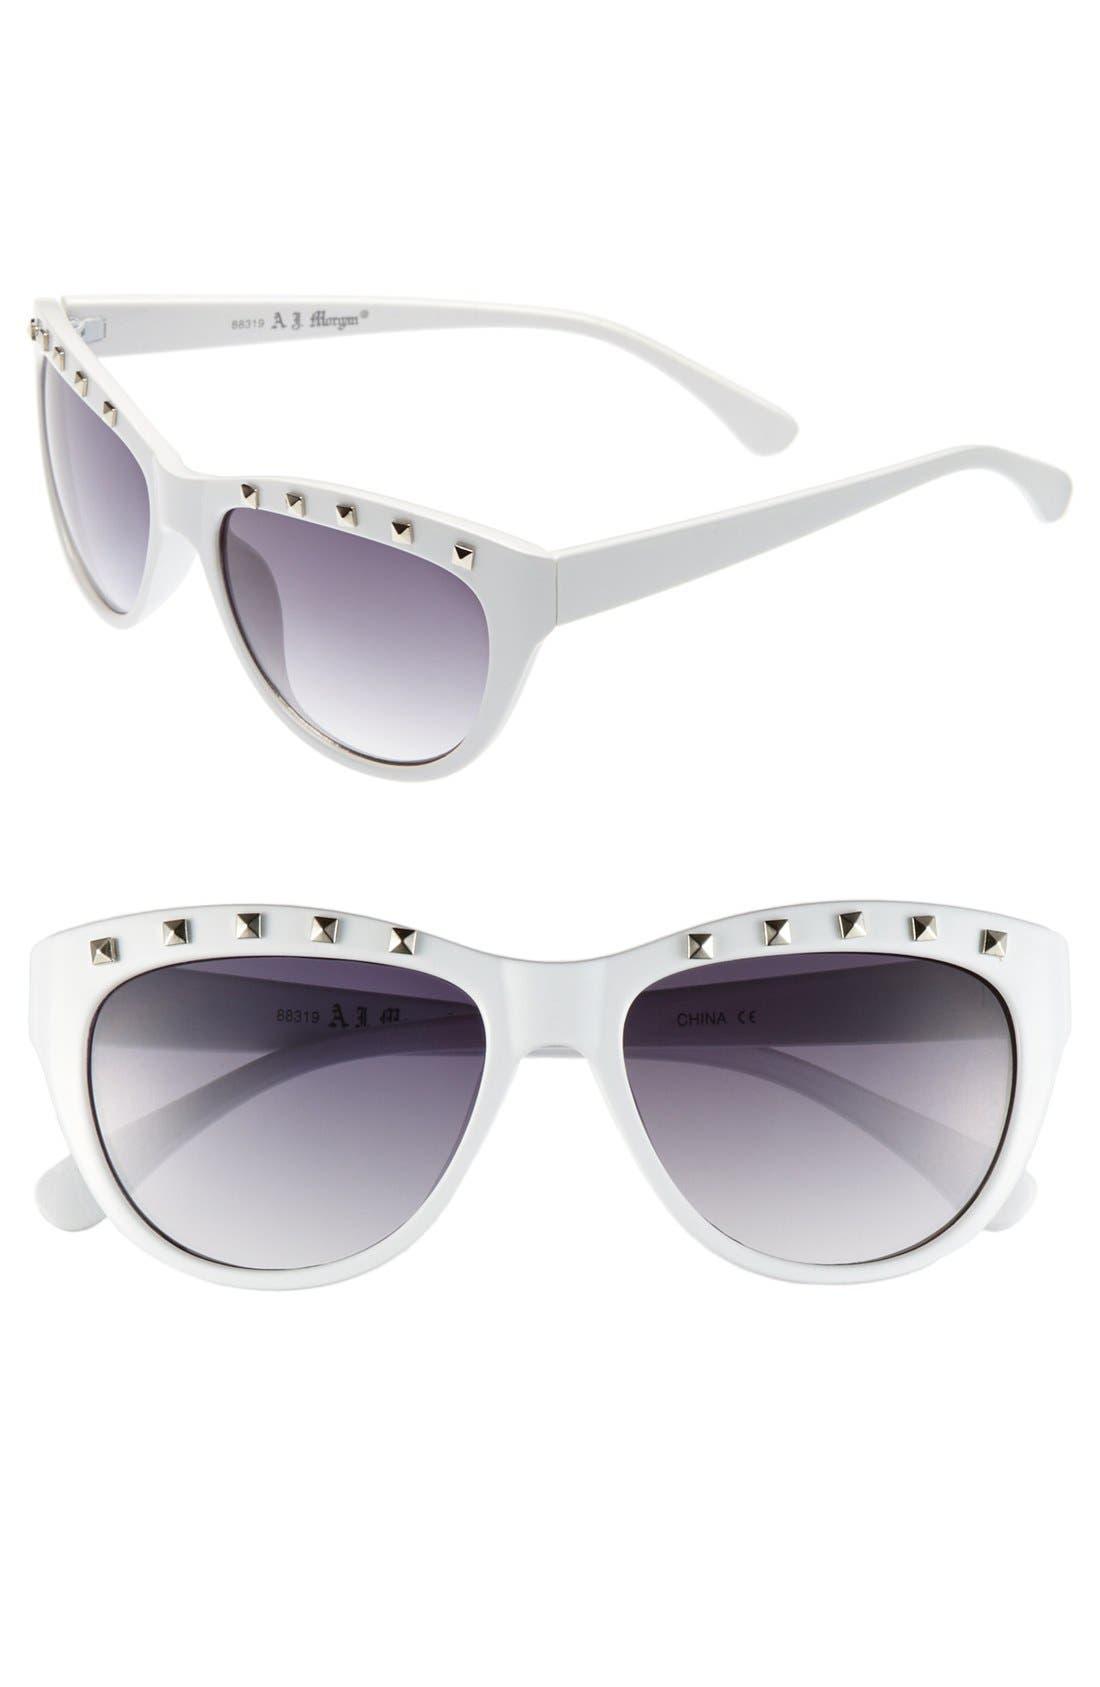 Alternate Image 1 Selected - A.J. Morgan 'Casino' Sunglasses